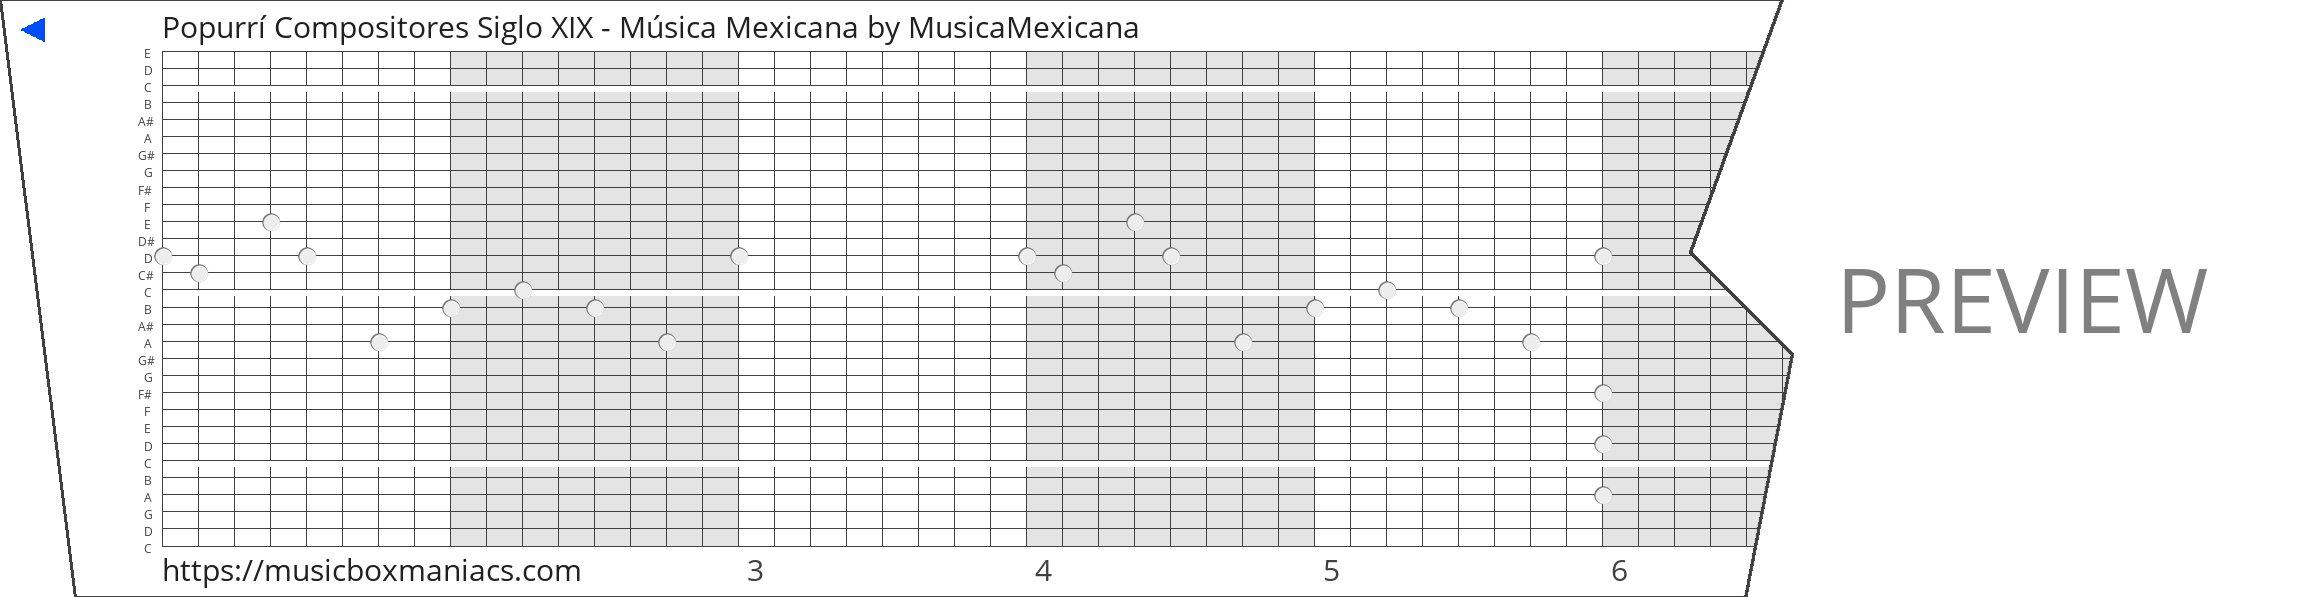 Popurrí Compositores Siglo XIX - Música Mexicana 30 note music box paper strip